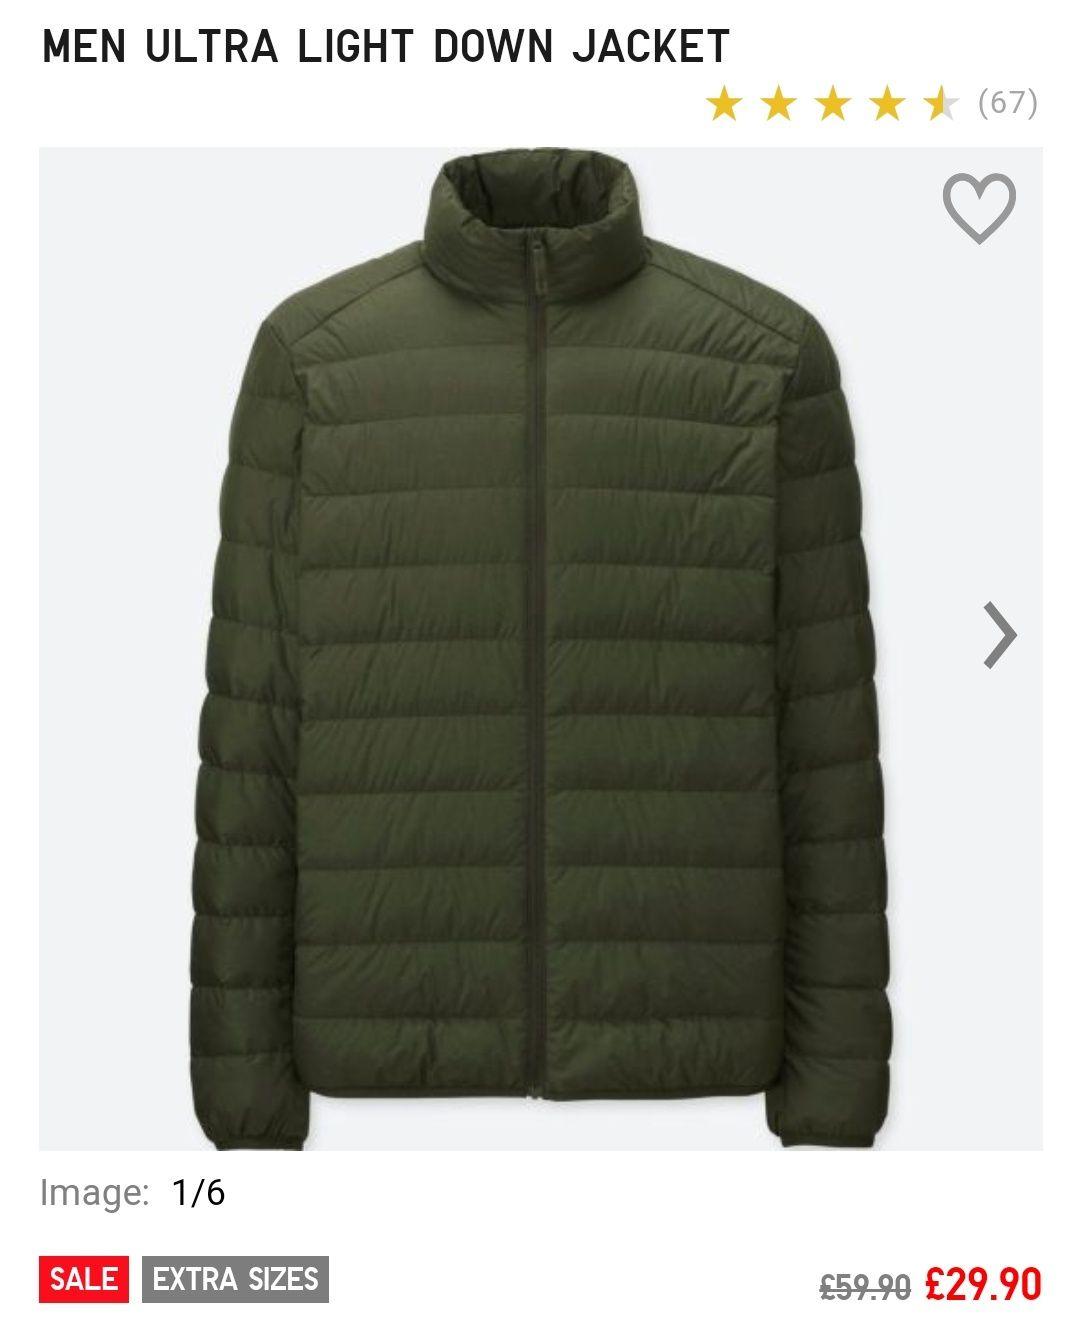 Uniqlo men's ultra light down jacket £29.9